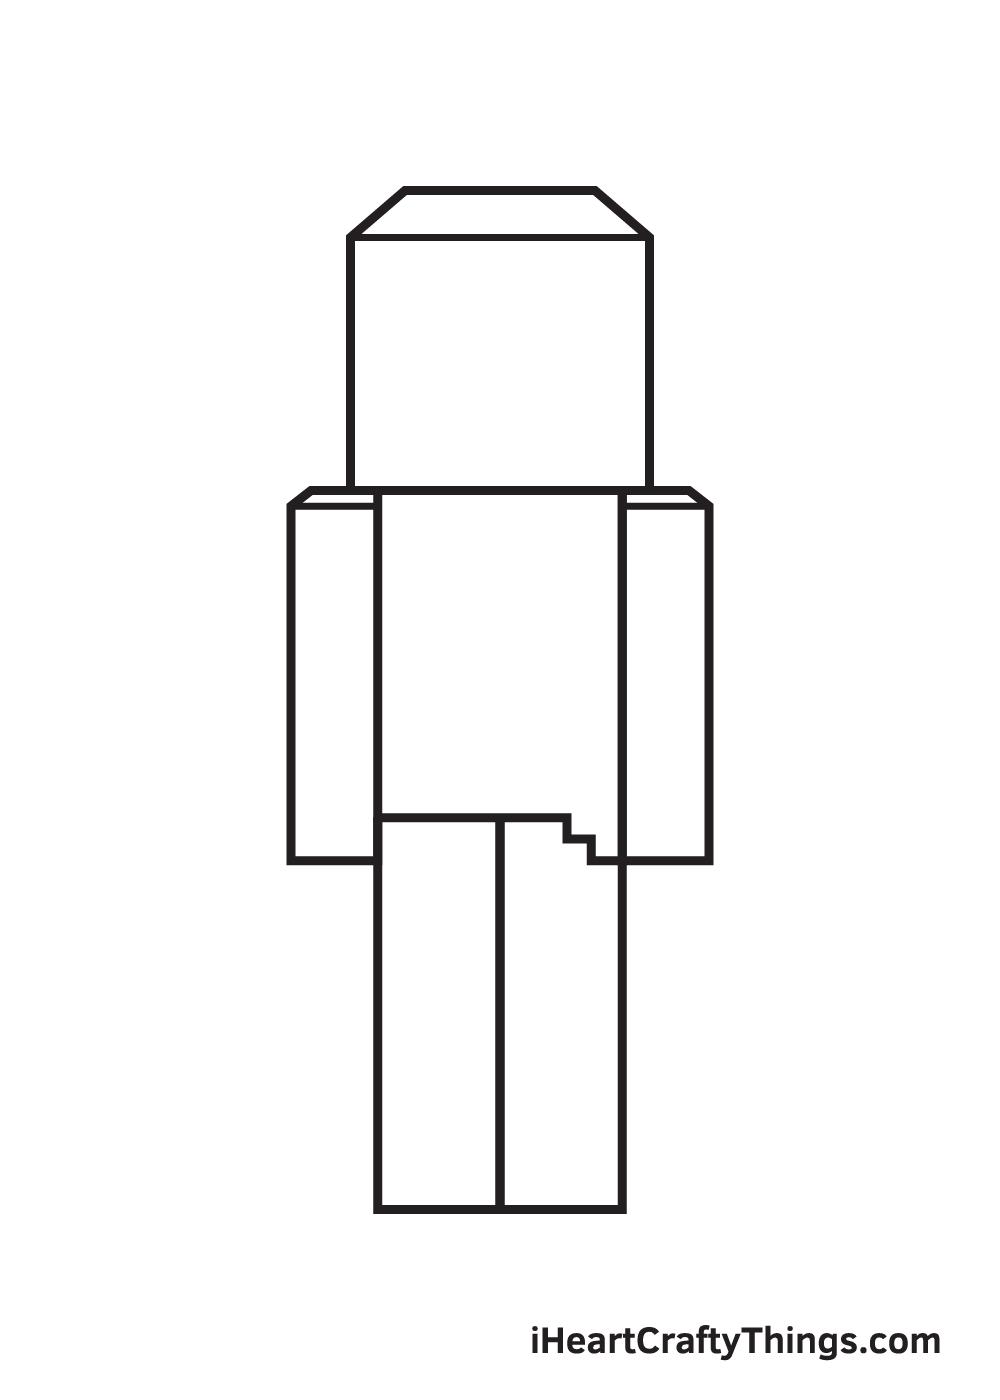 minecraft drawing step 4